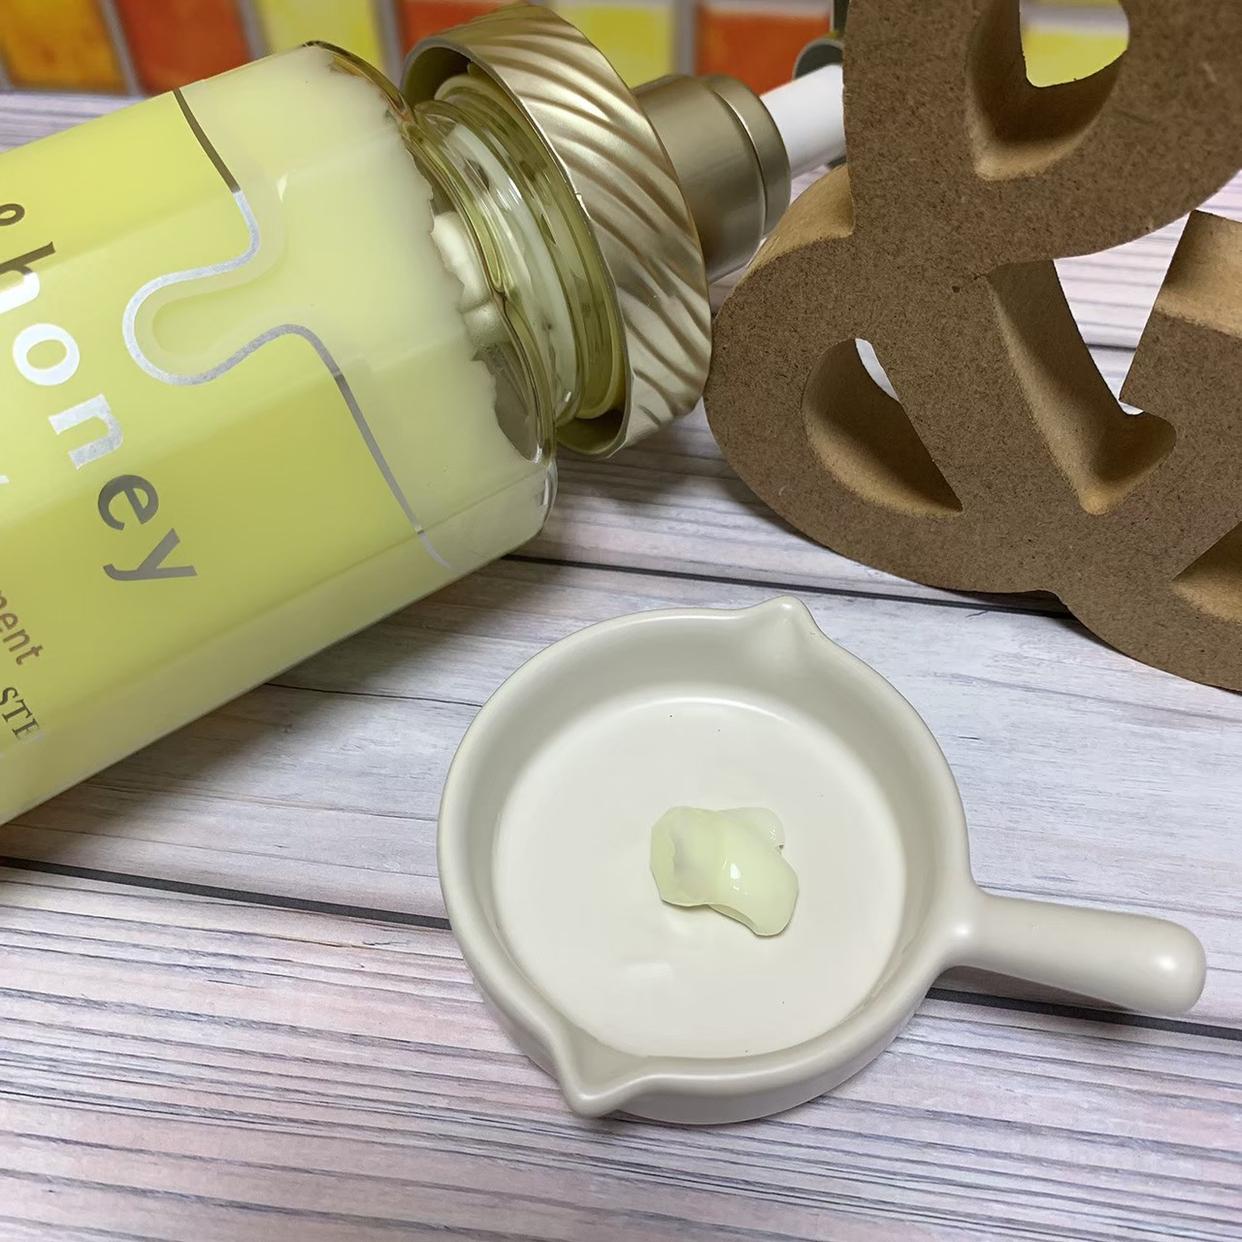 &honey(アンドハニー) スムースモイストシャンプーを使ったkana_cafe_timeさんのクチコミ画像2